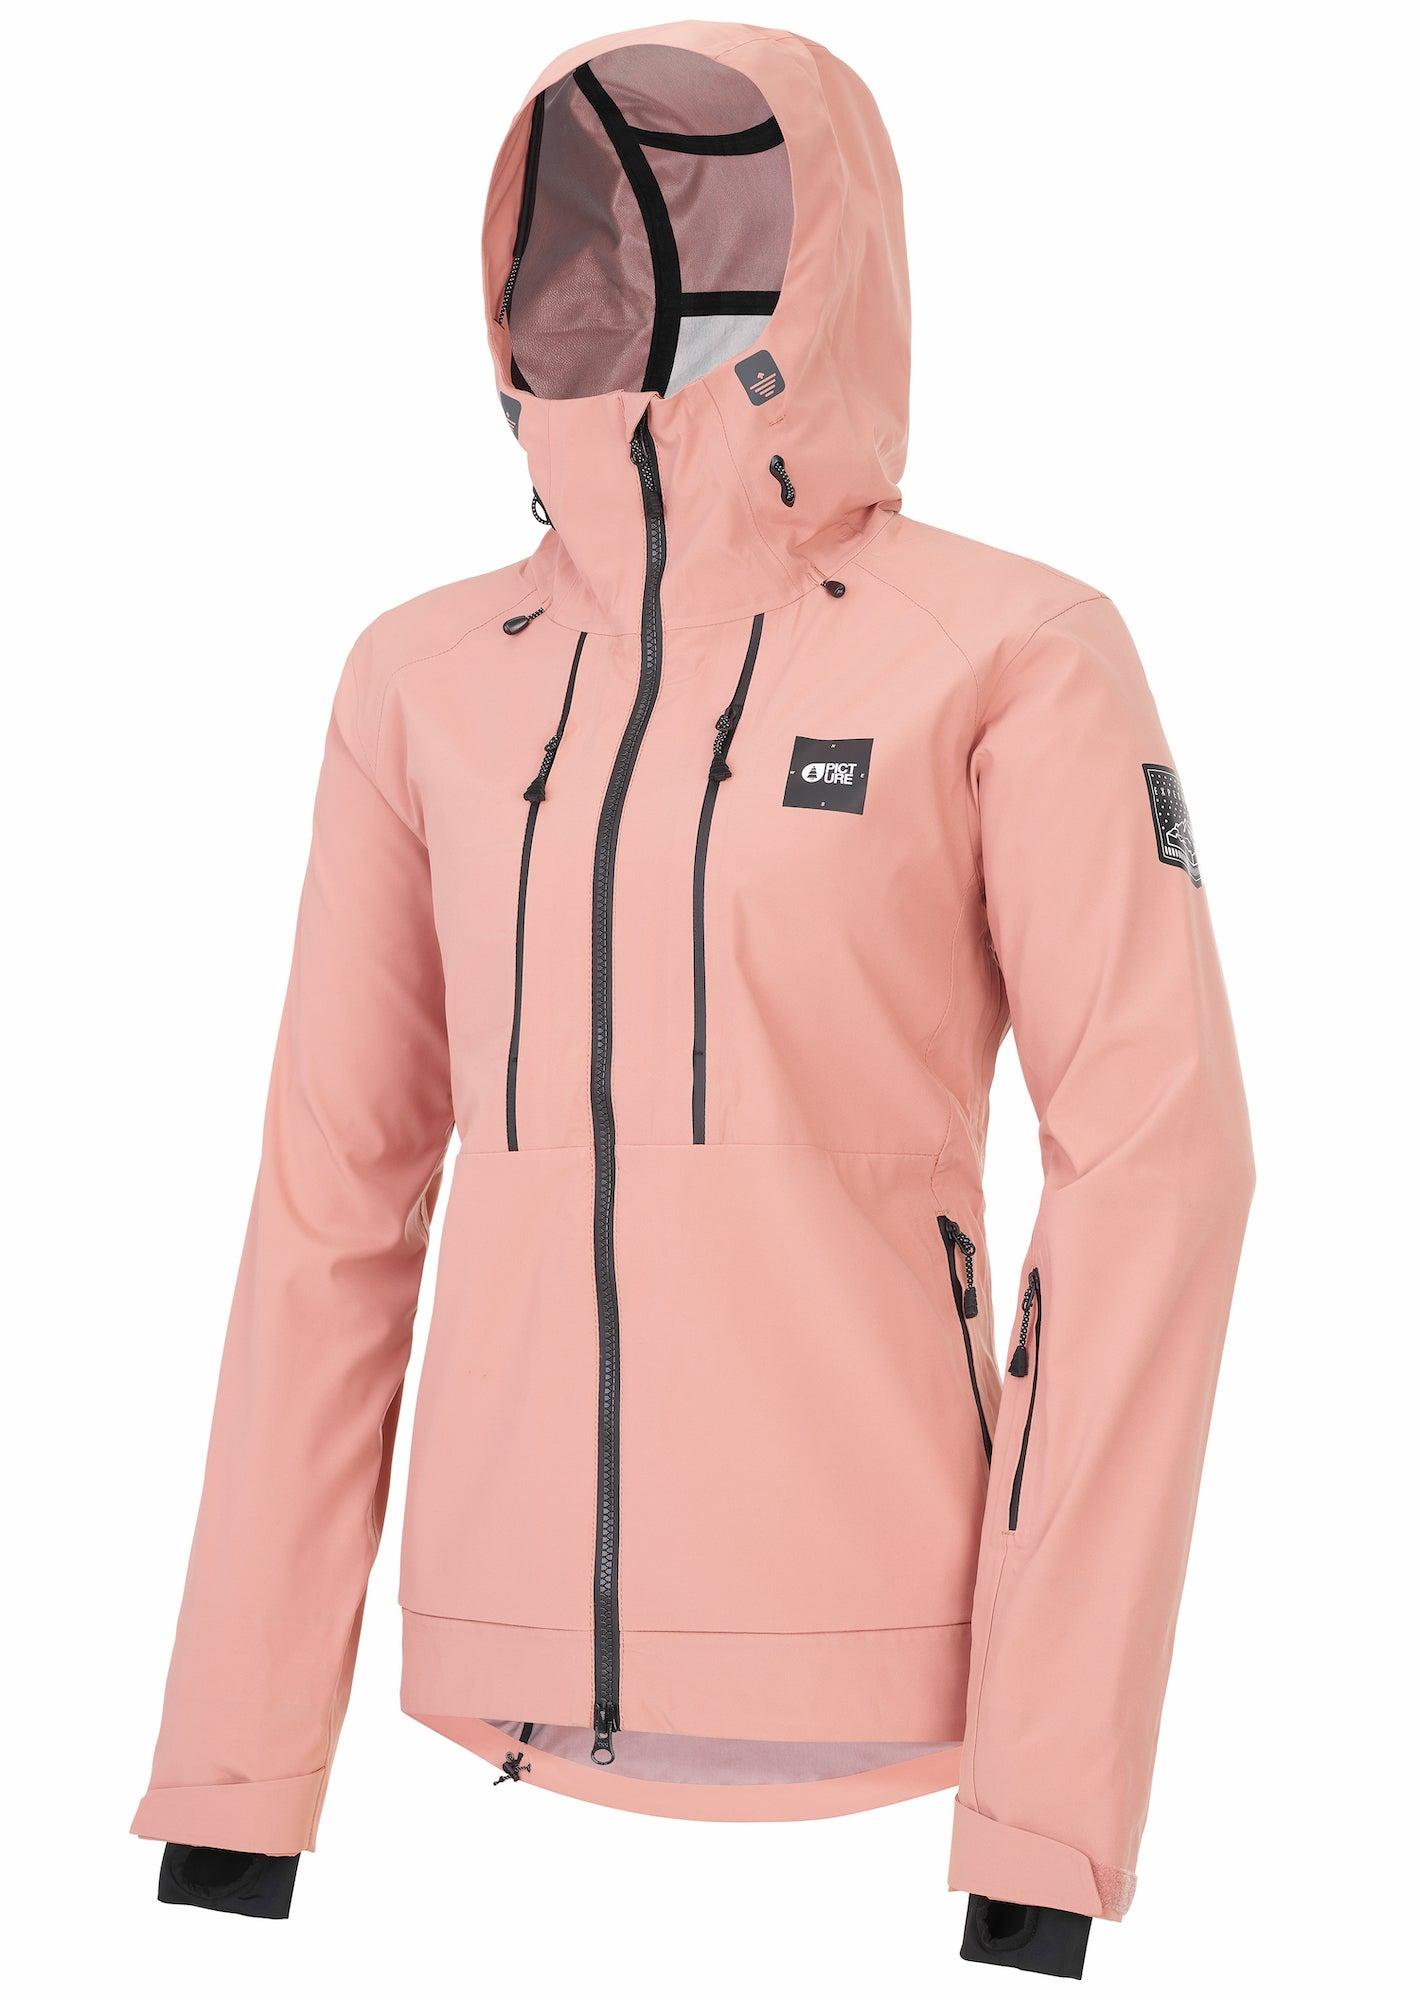 Women's Picture Organic Aero Ski Jacket